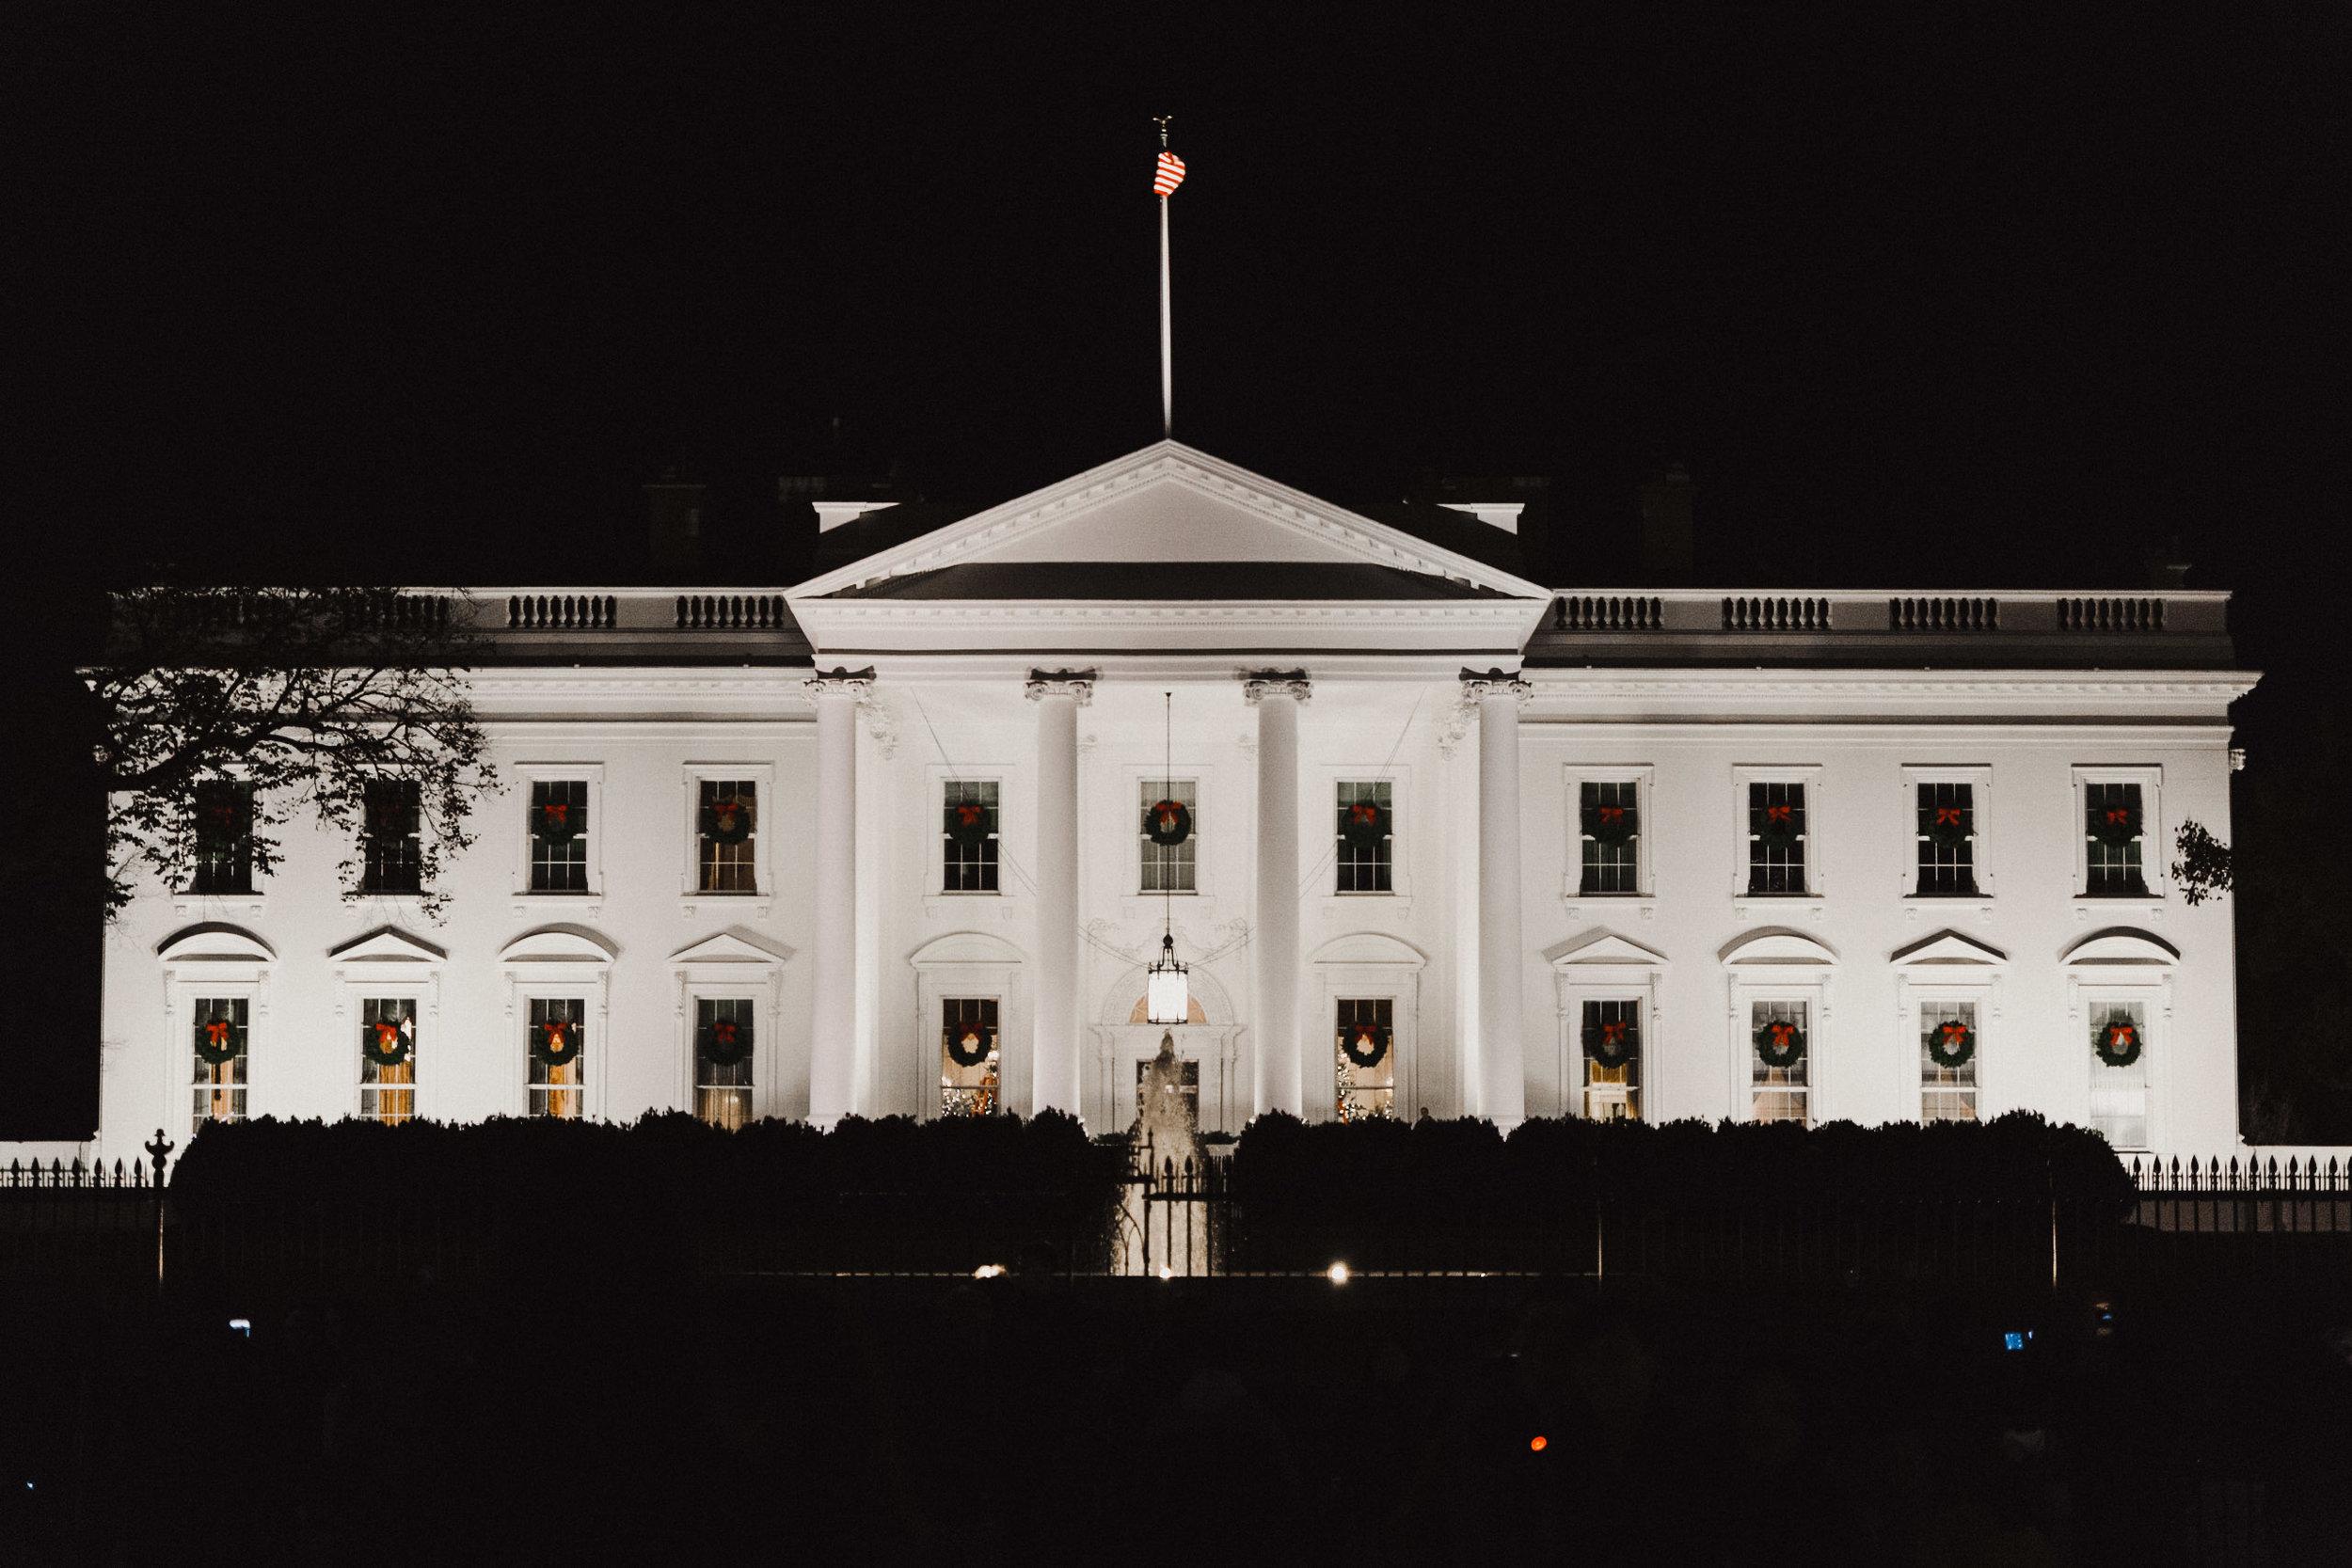 Washington-374.jpg